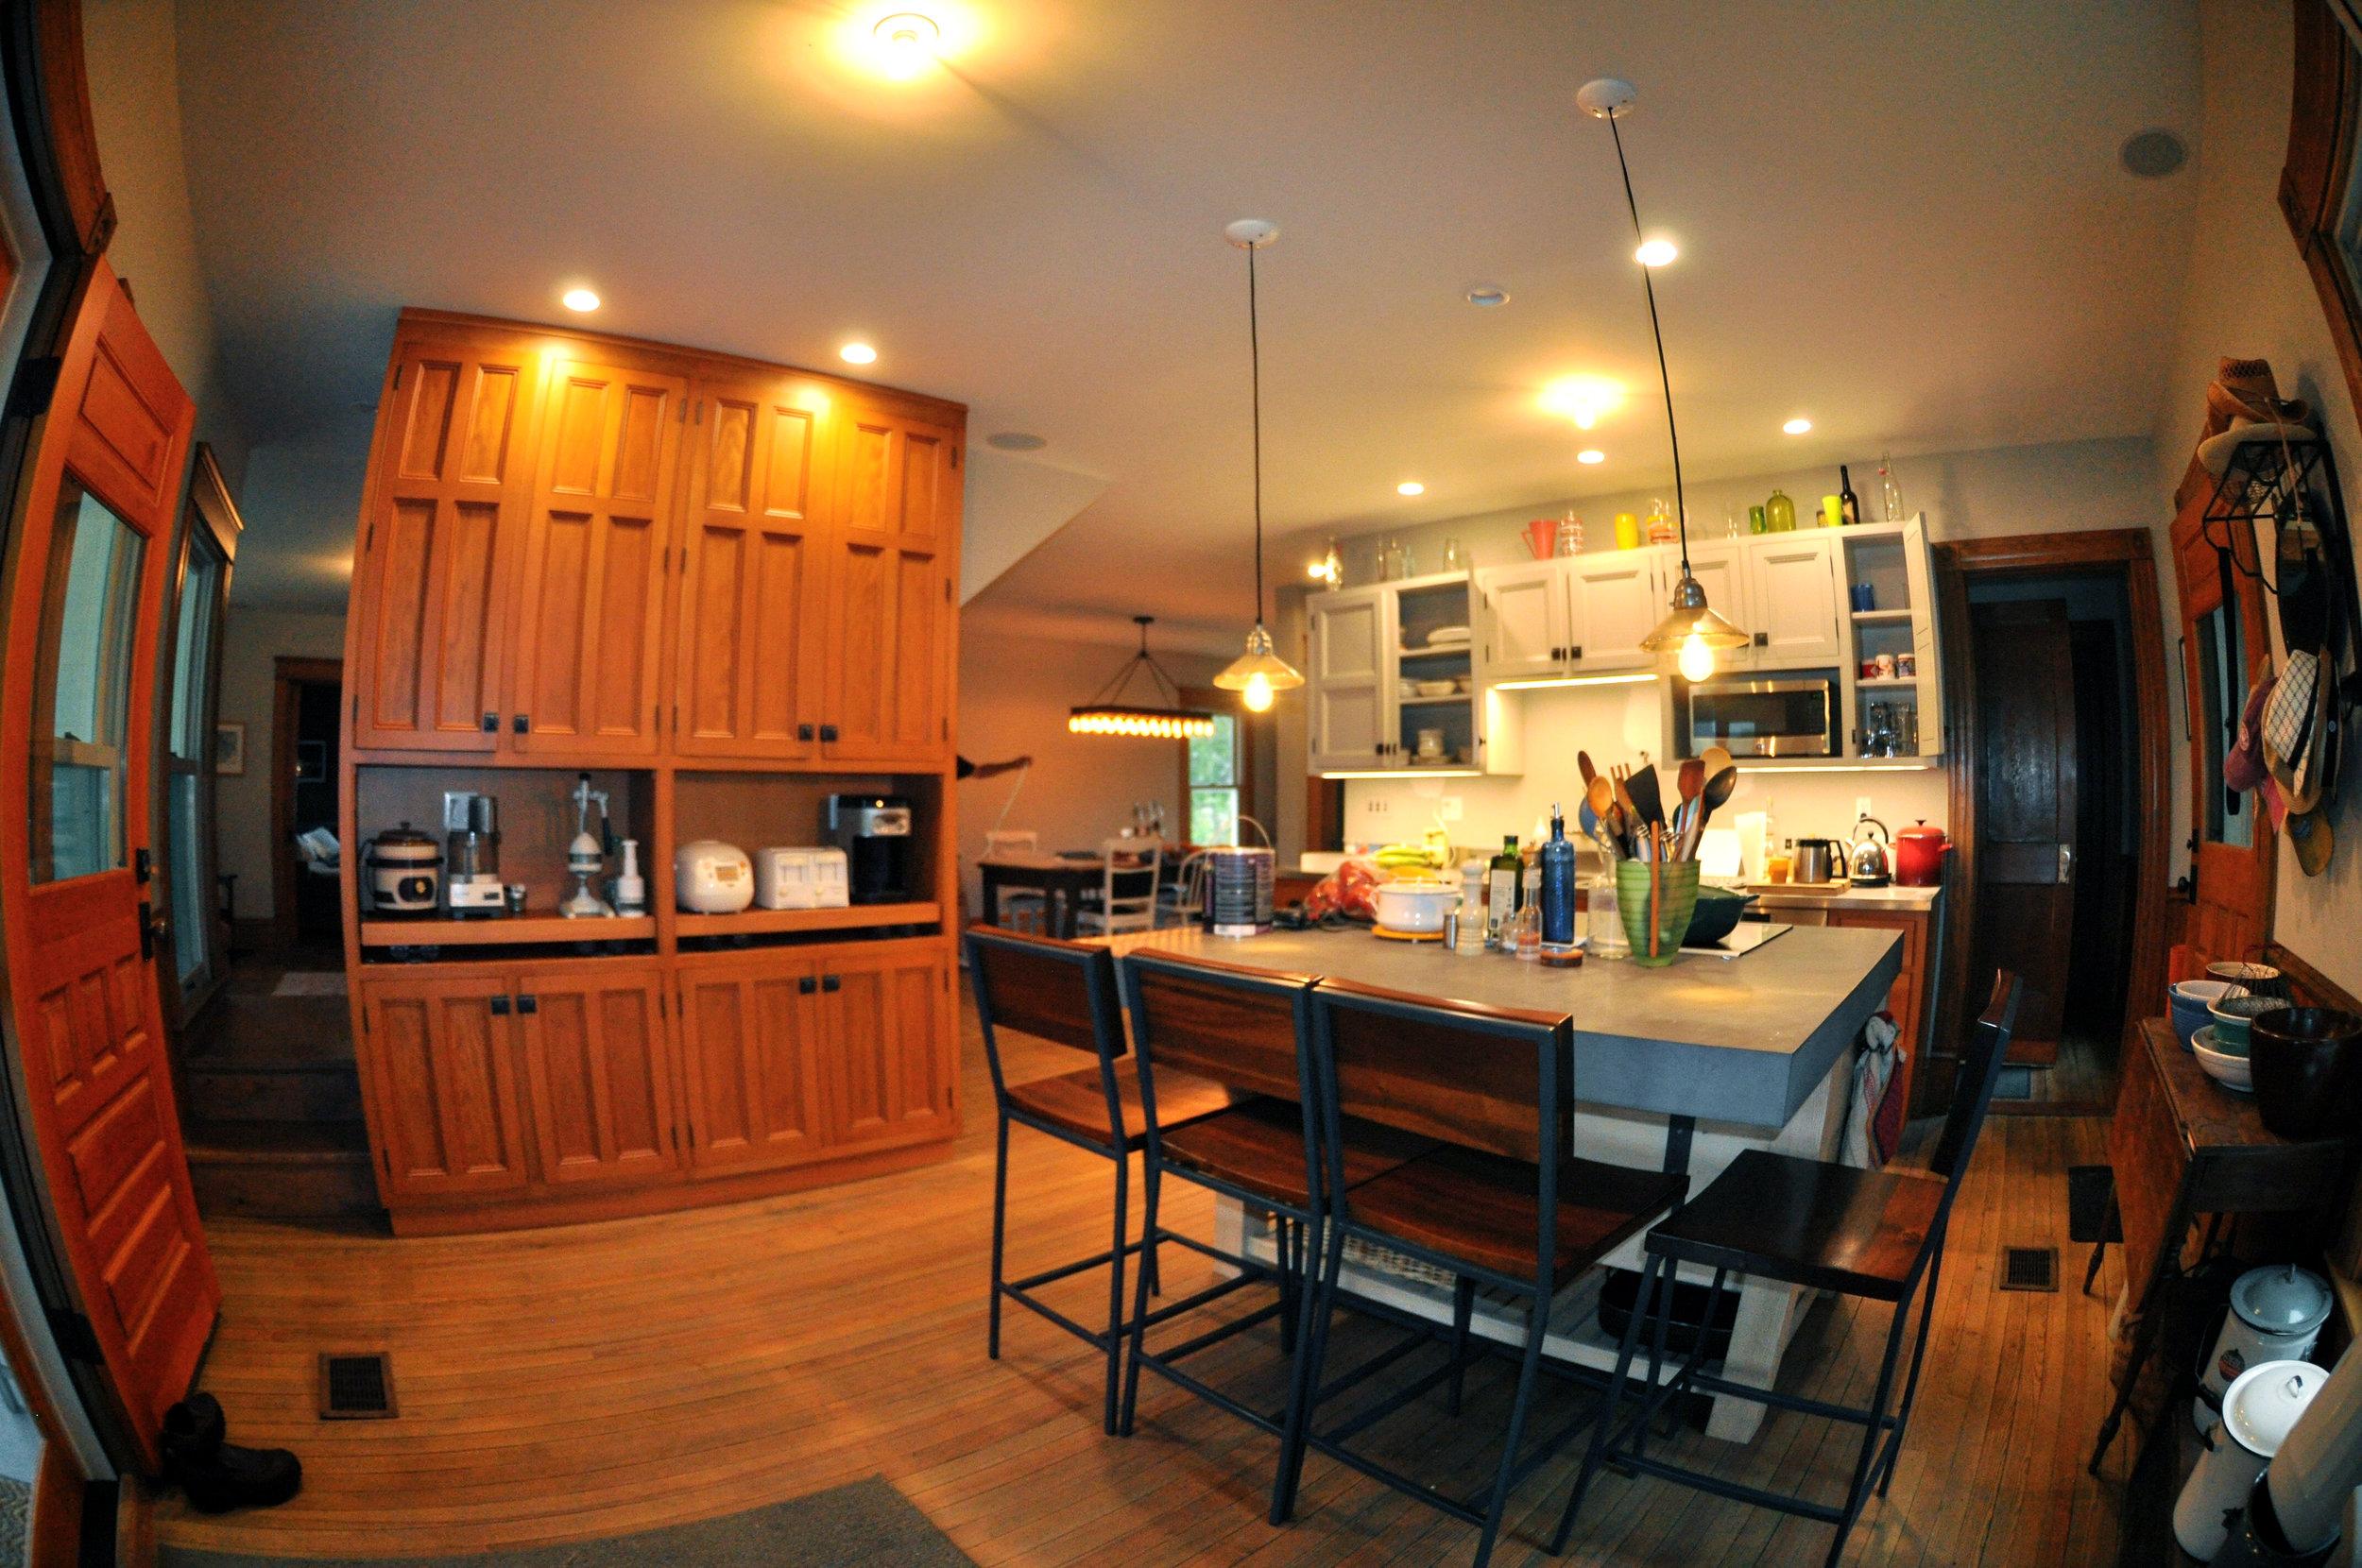 modernized rural farmhouse, residential renovation, open plan, new kitchen, new interior finishes, kitchen island